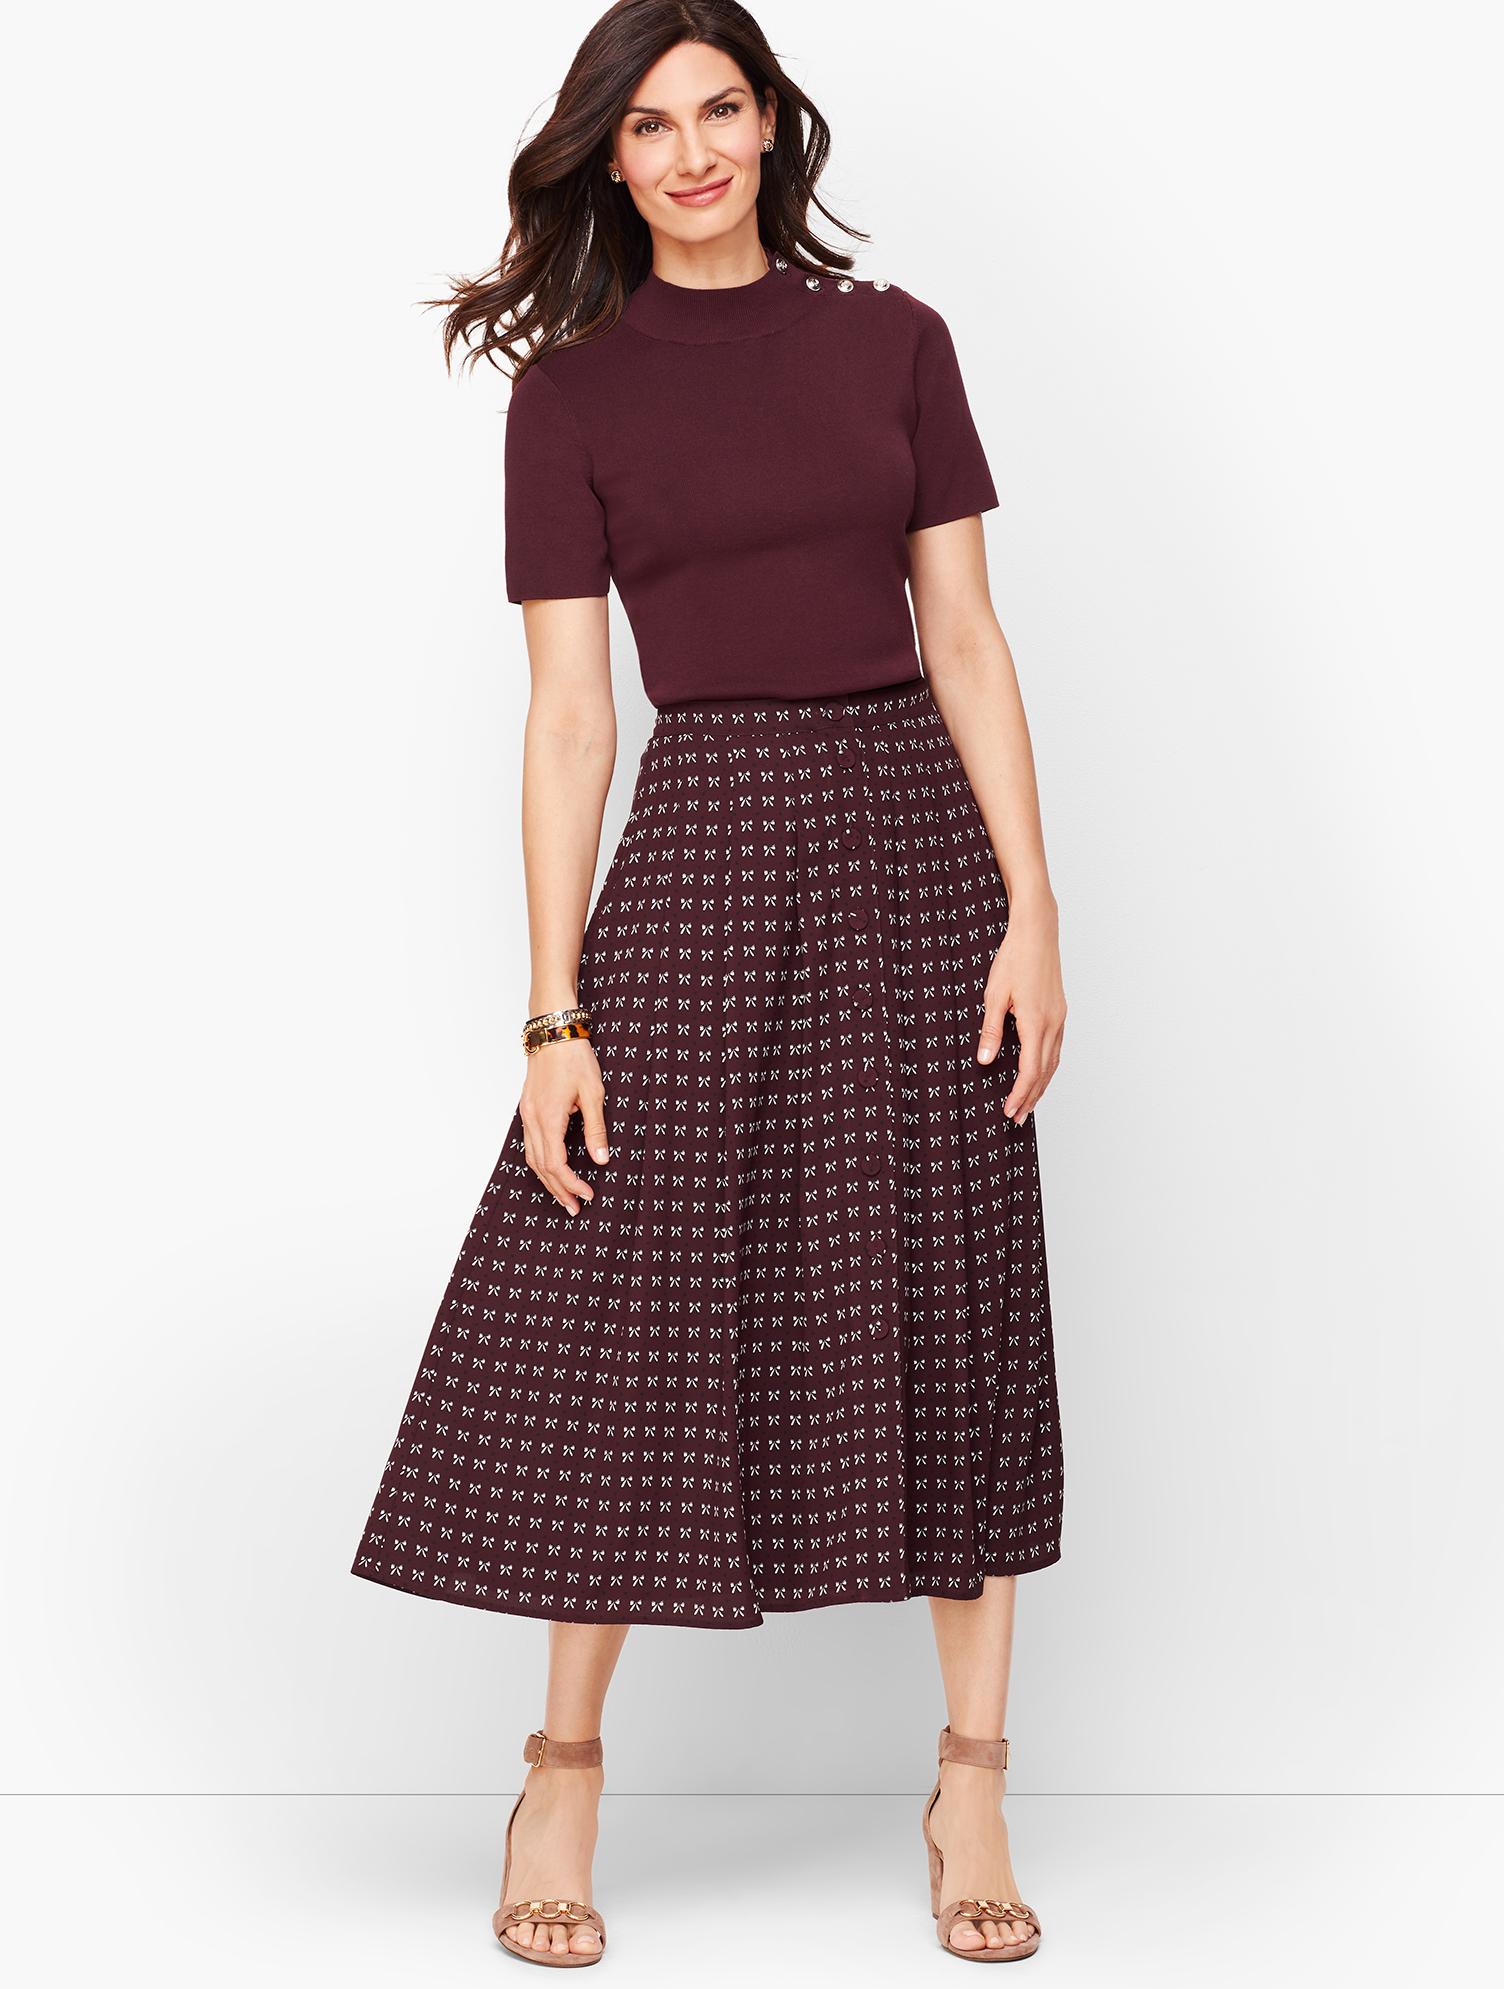 60s Skirts | 70s Hippie Skirts, Jumper Dresses Dotty Bows Midi Skirt - RICH-BURGUNDY - 16 - Talbots $49.99 AT vintagedancer.com